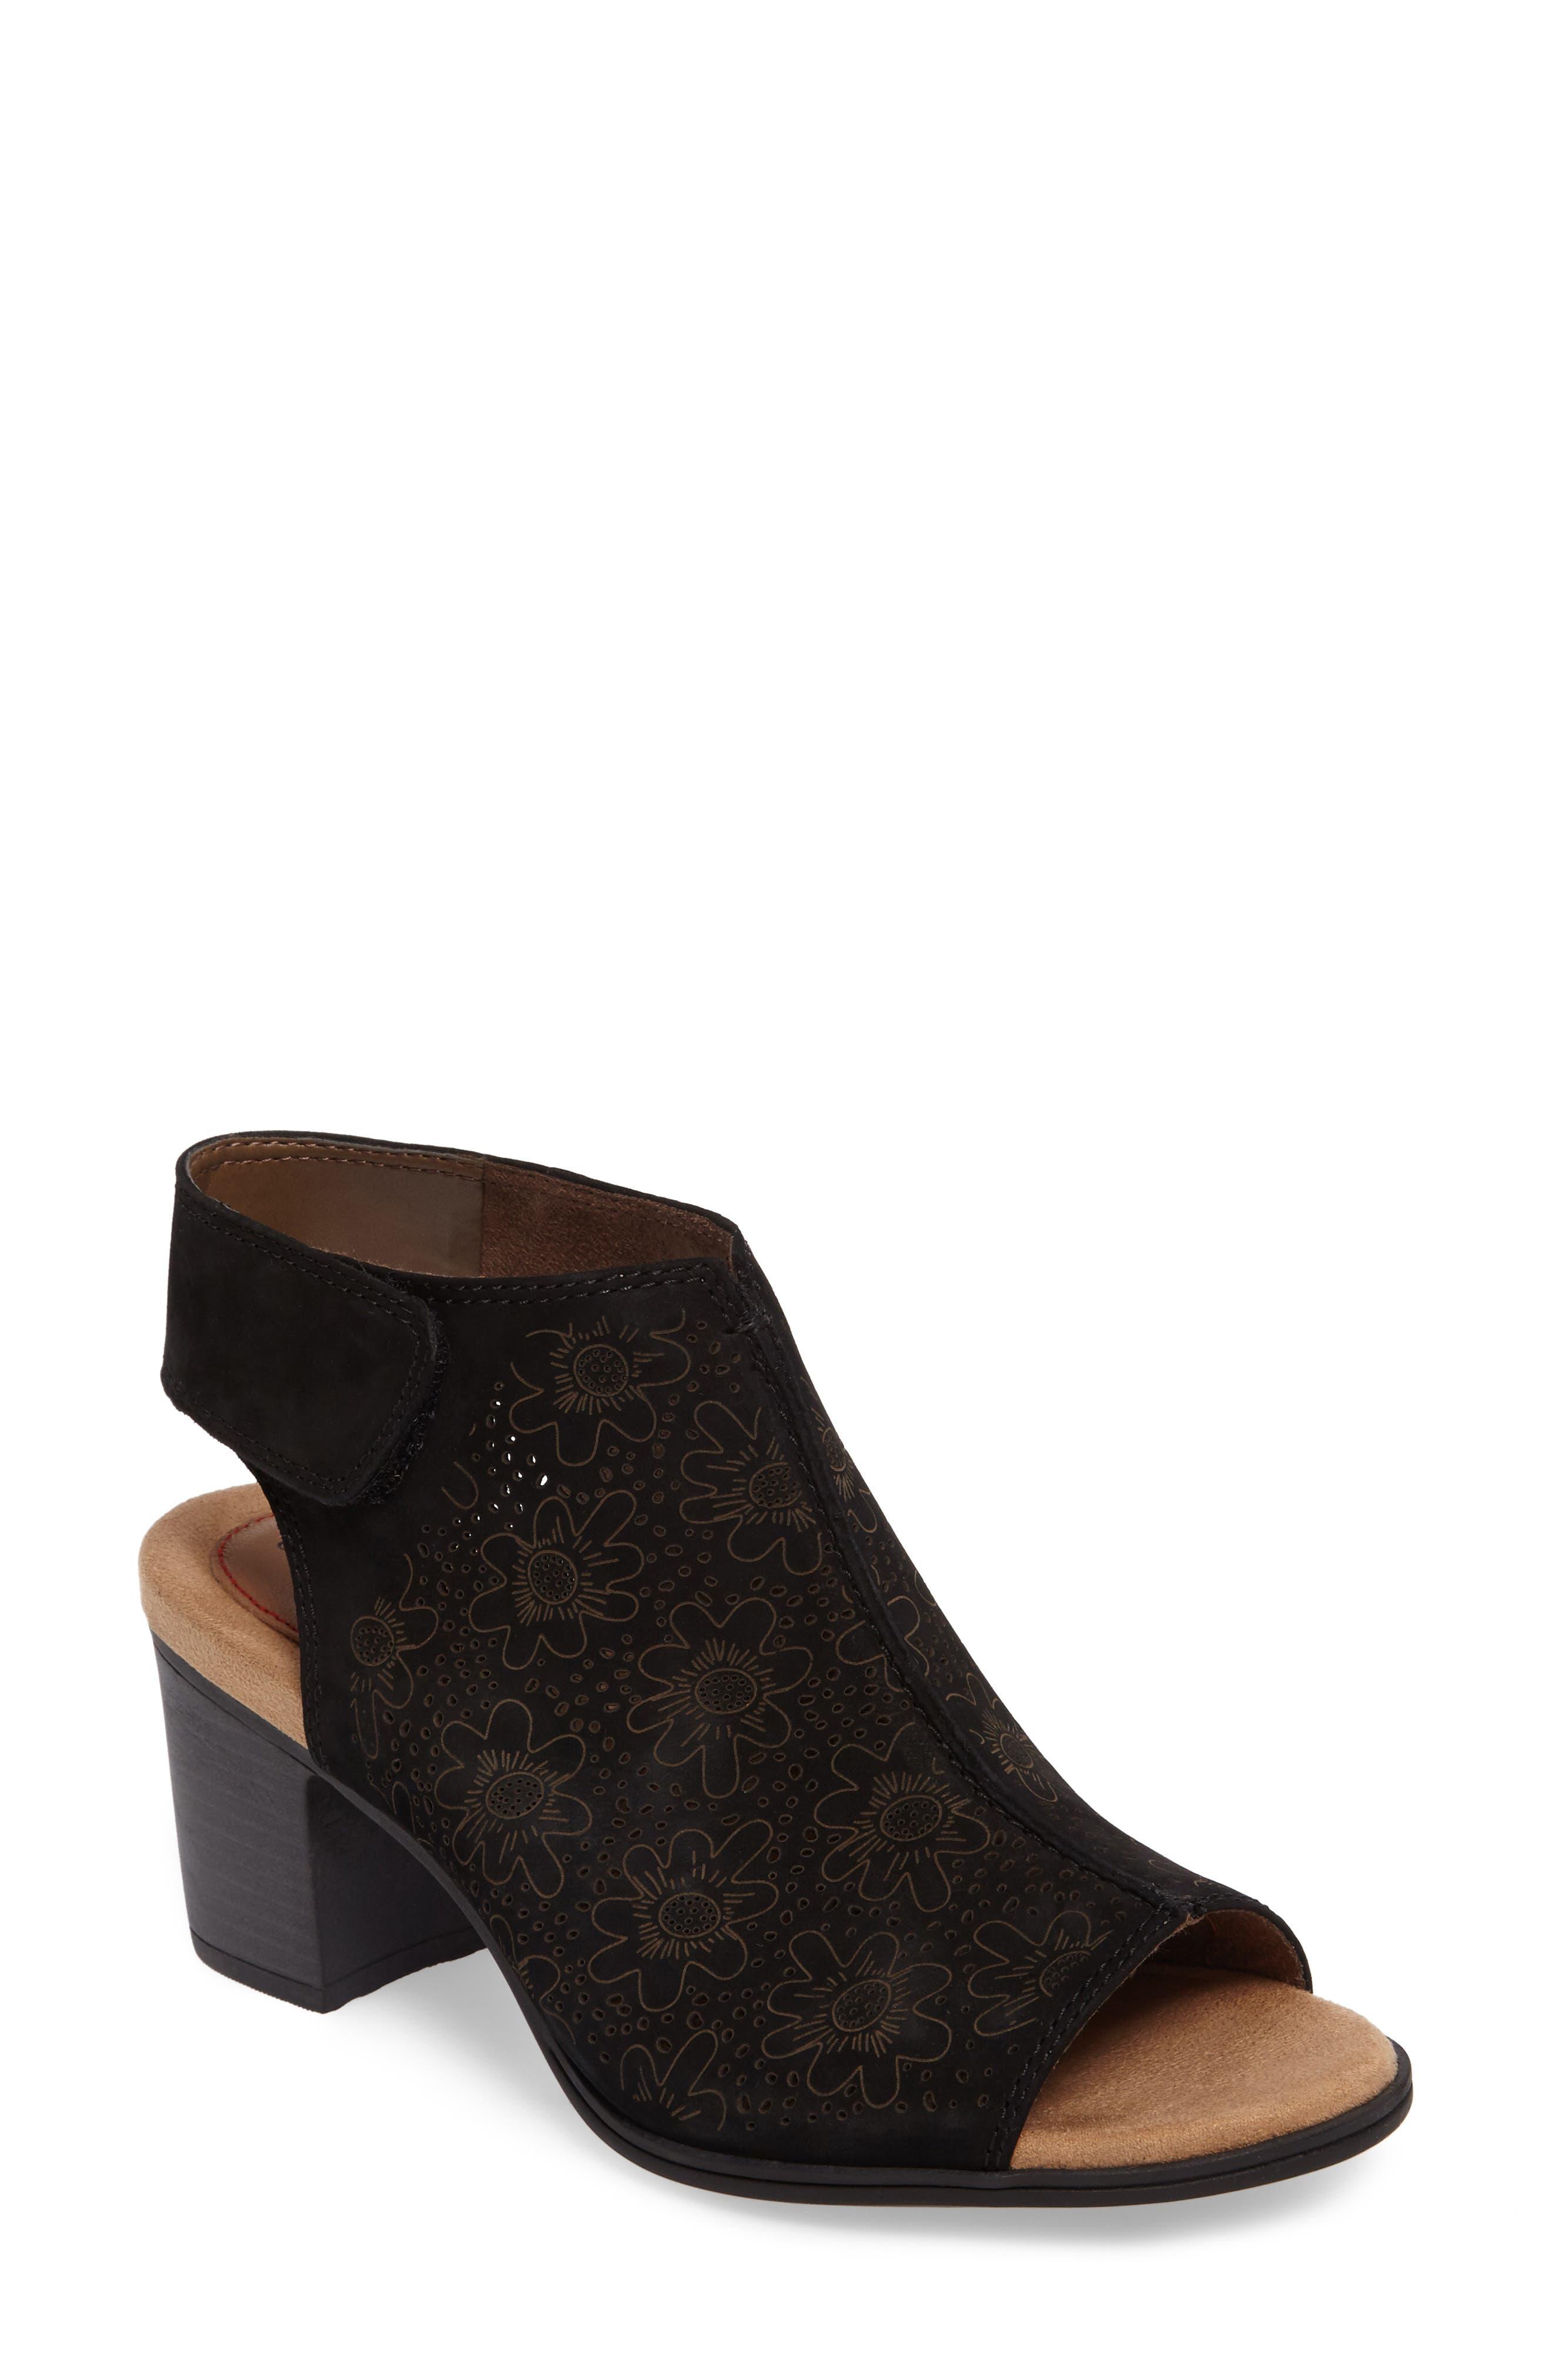 ROCKPORT COBB HILL,                             Hattie Perforated Slingback Sandal,                             Main thumbnail 1, color,                             BLACK NUBUCK